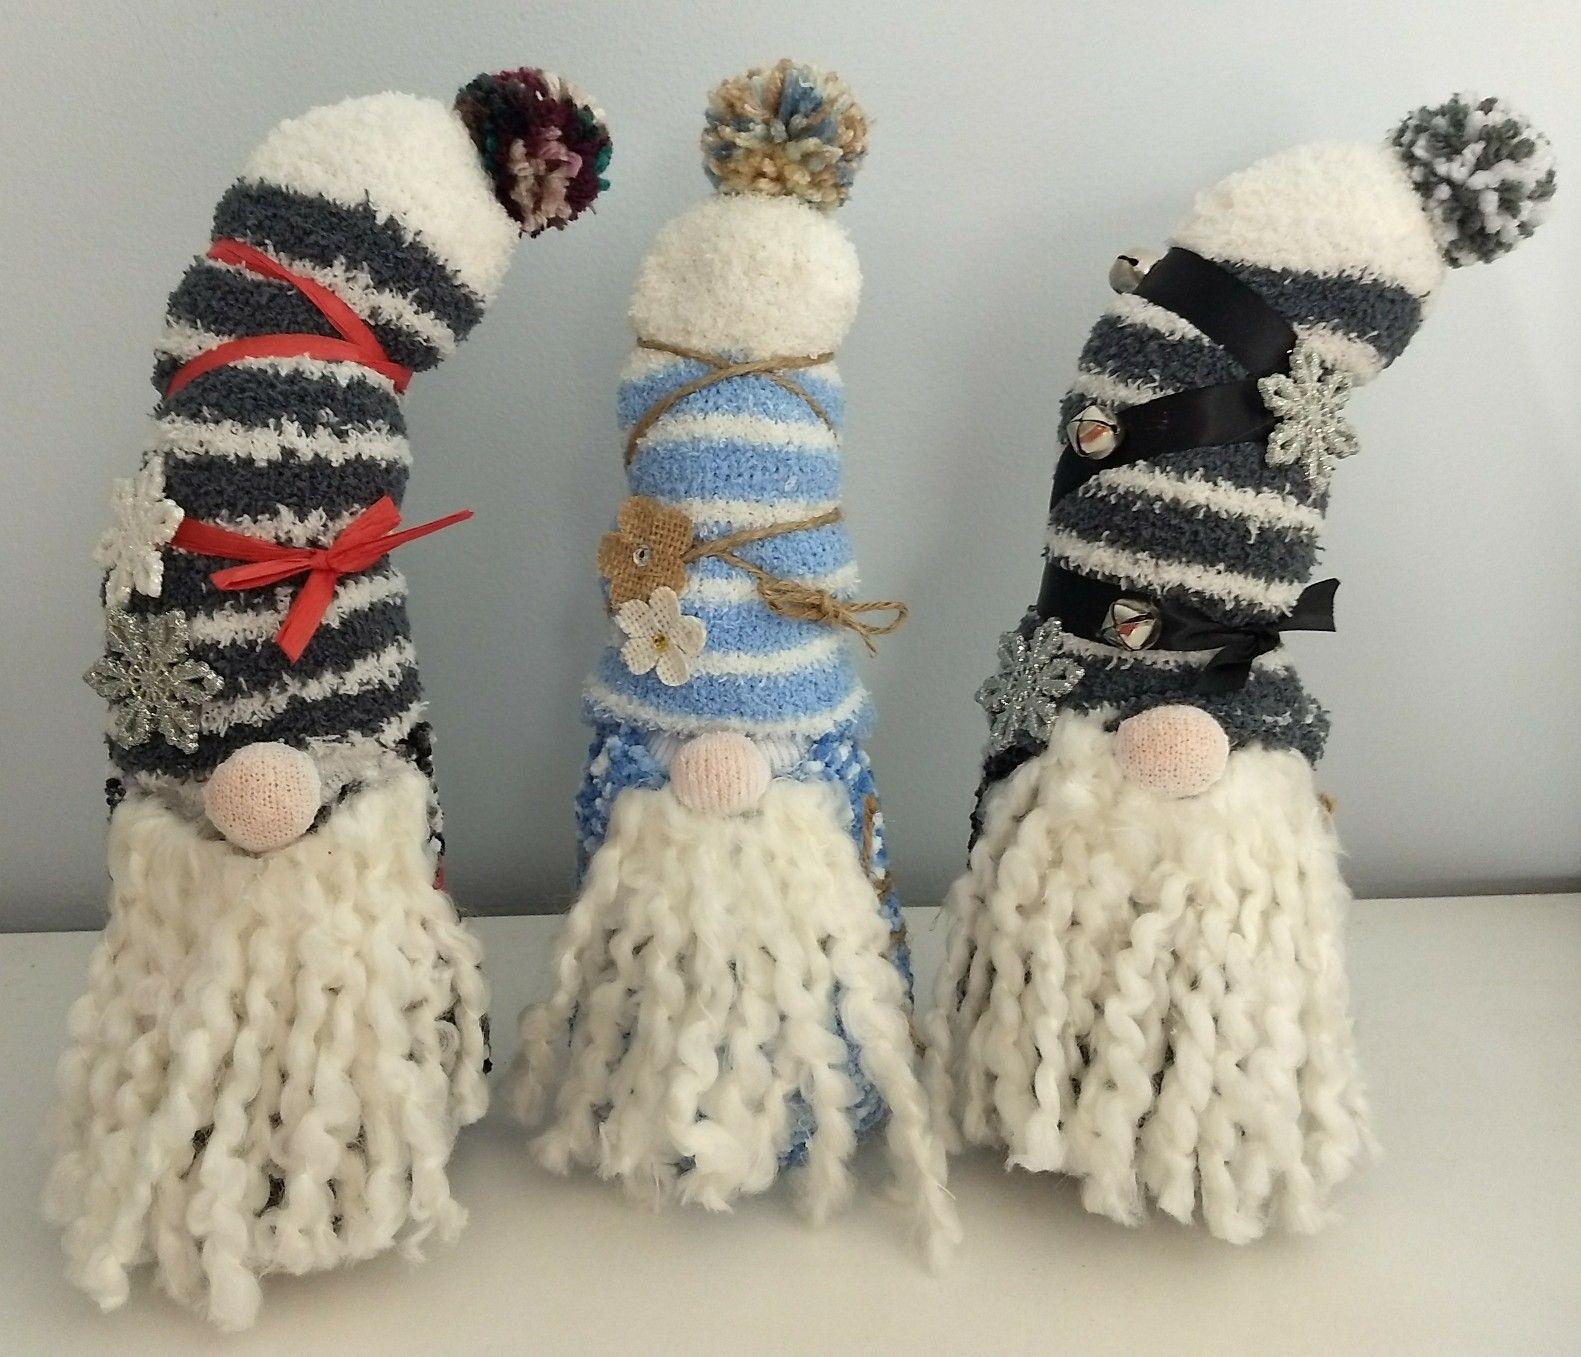 Pin by Lora Drum on Gnome Sweet Gnome Creative, Diy, Leg